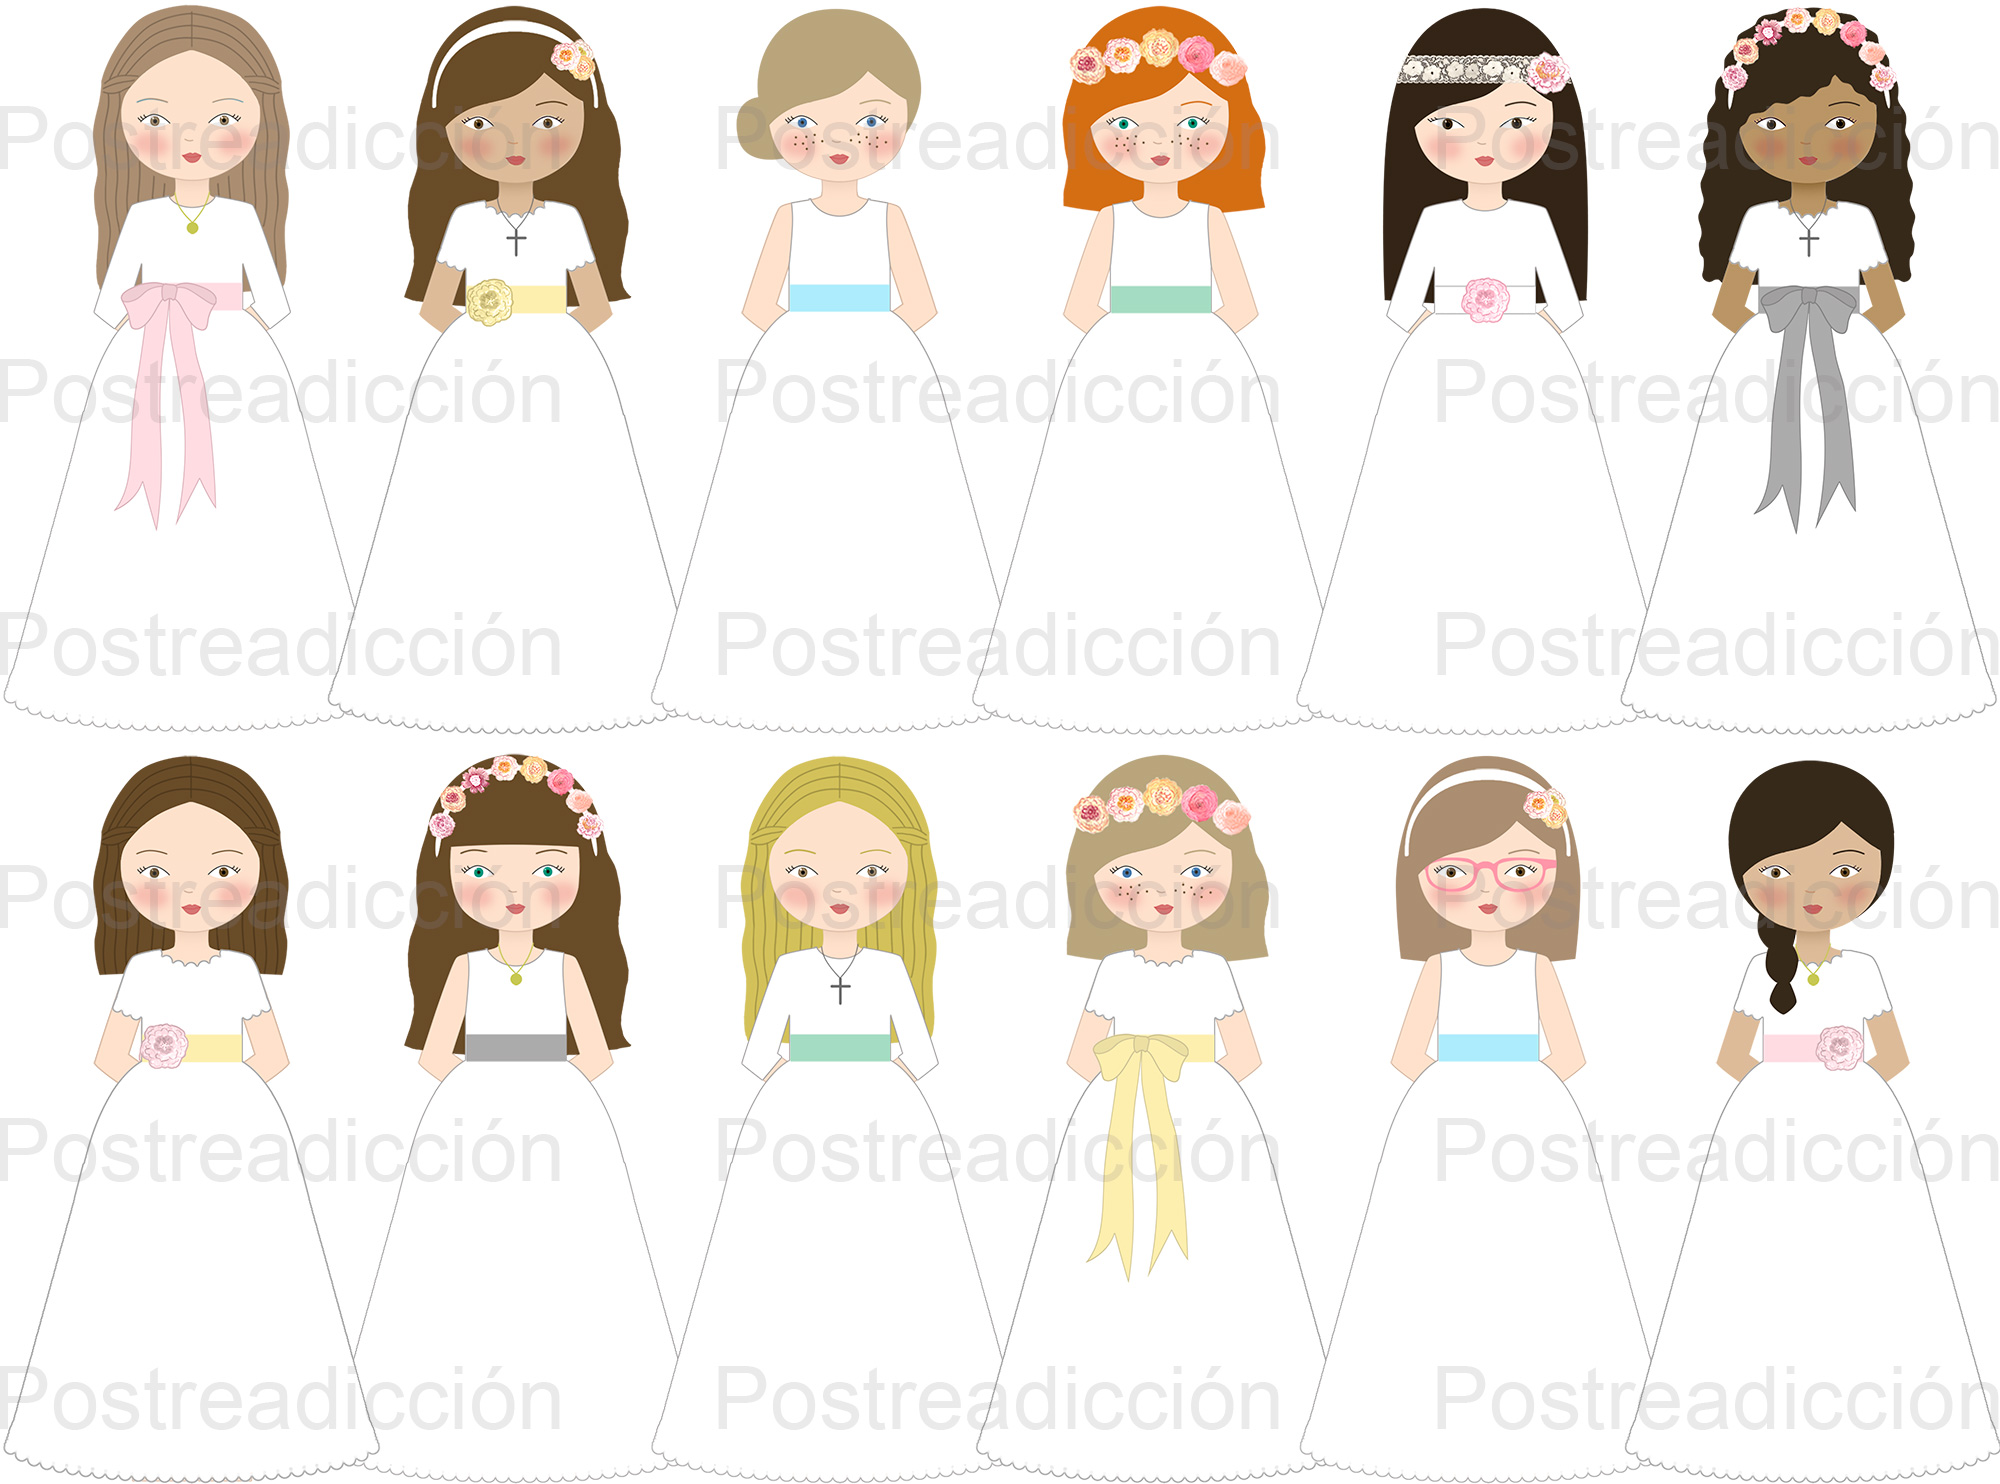 Imagen de producto: https://tienda.postreadiccion.com/img/articulos/secundarias6951-modelo-no-809-nina-de-comunion-carlota-para-minioreos-1.jpg